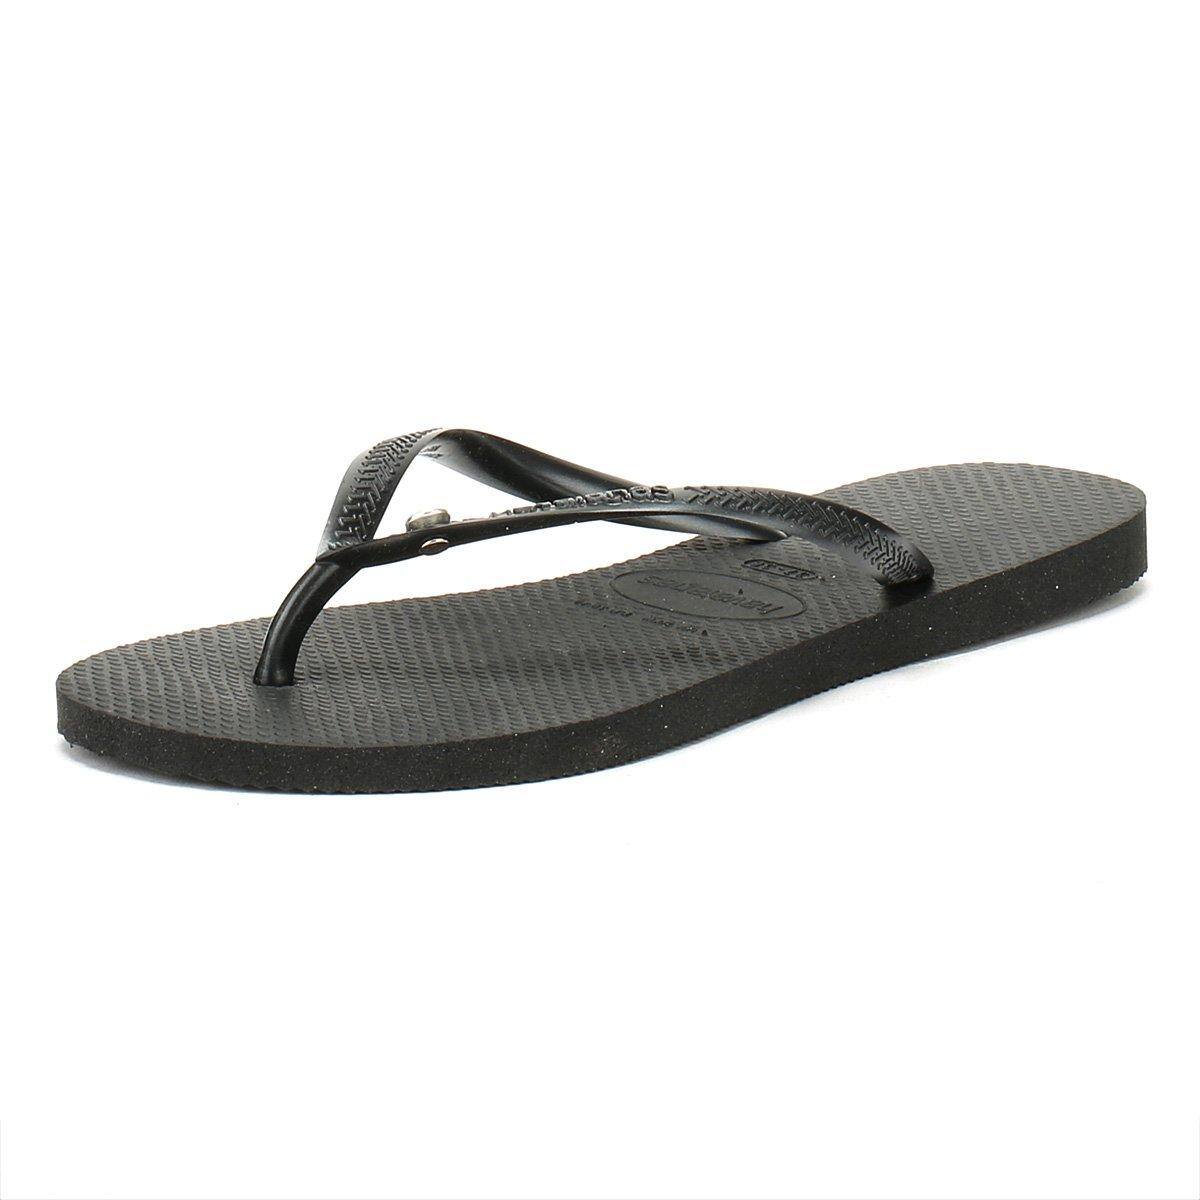 3be2cde15eb09 Havaianas Kids Slim Crystal Glamour Black - 33 34-uk1 2  Amazon.co.uk   Shoes   Bags